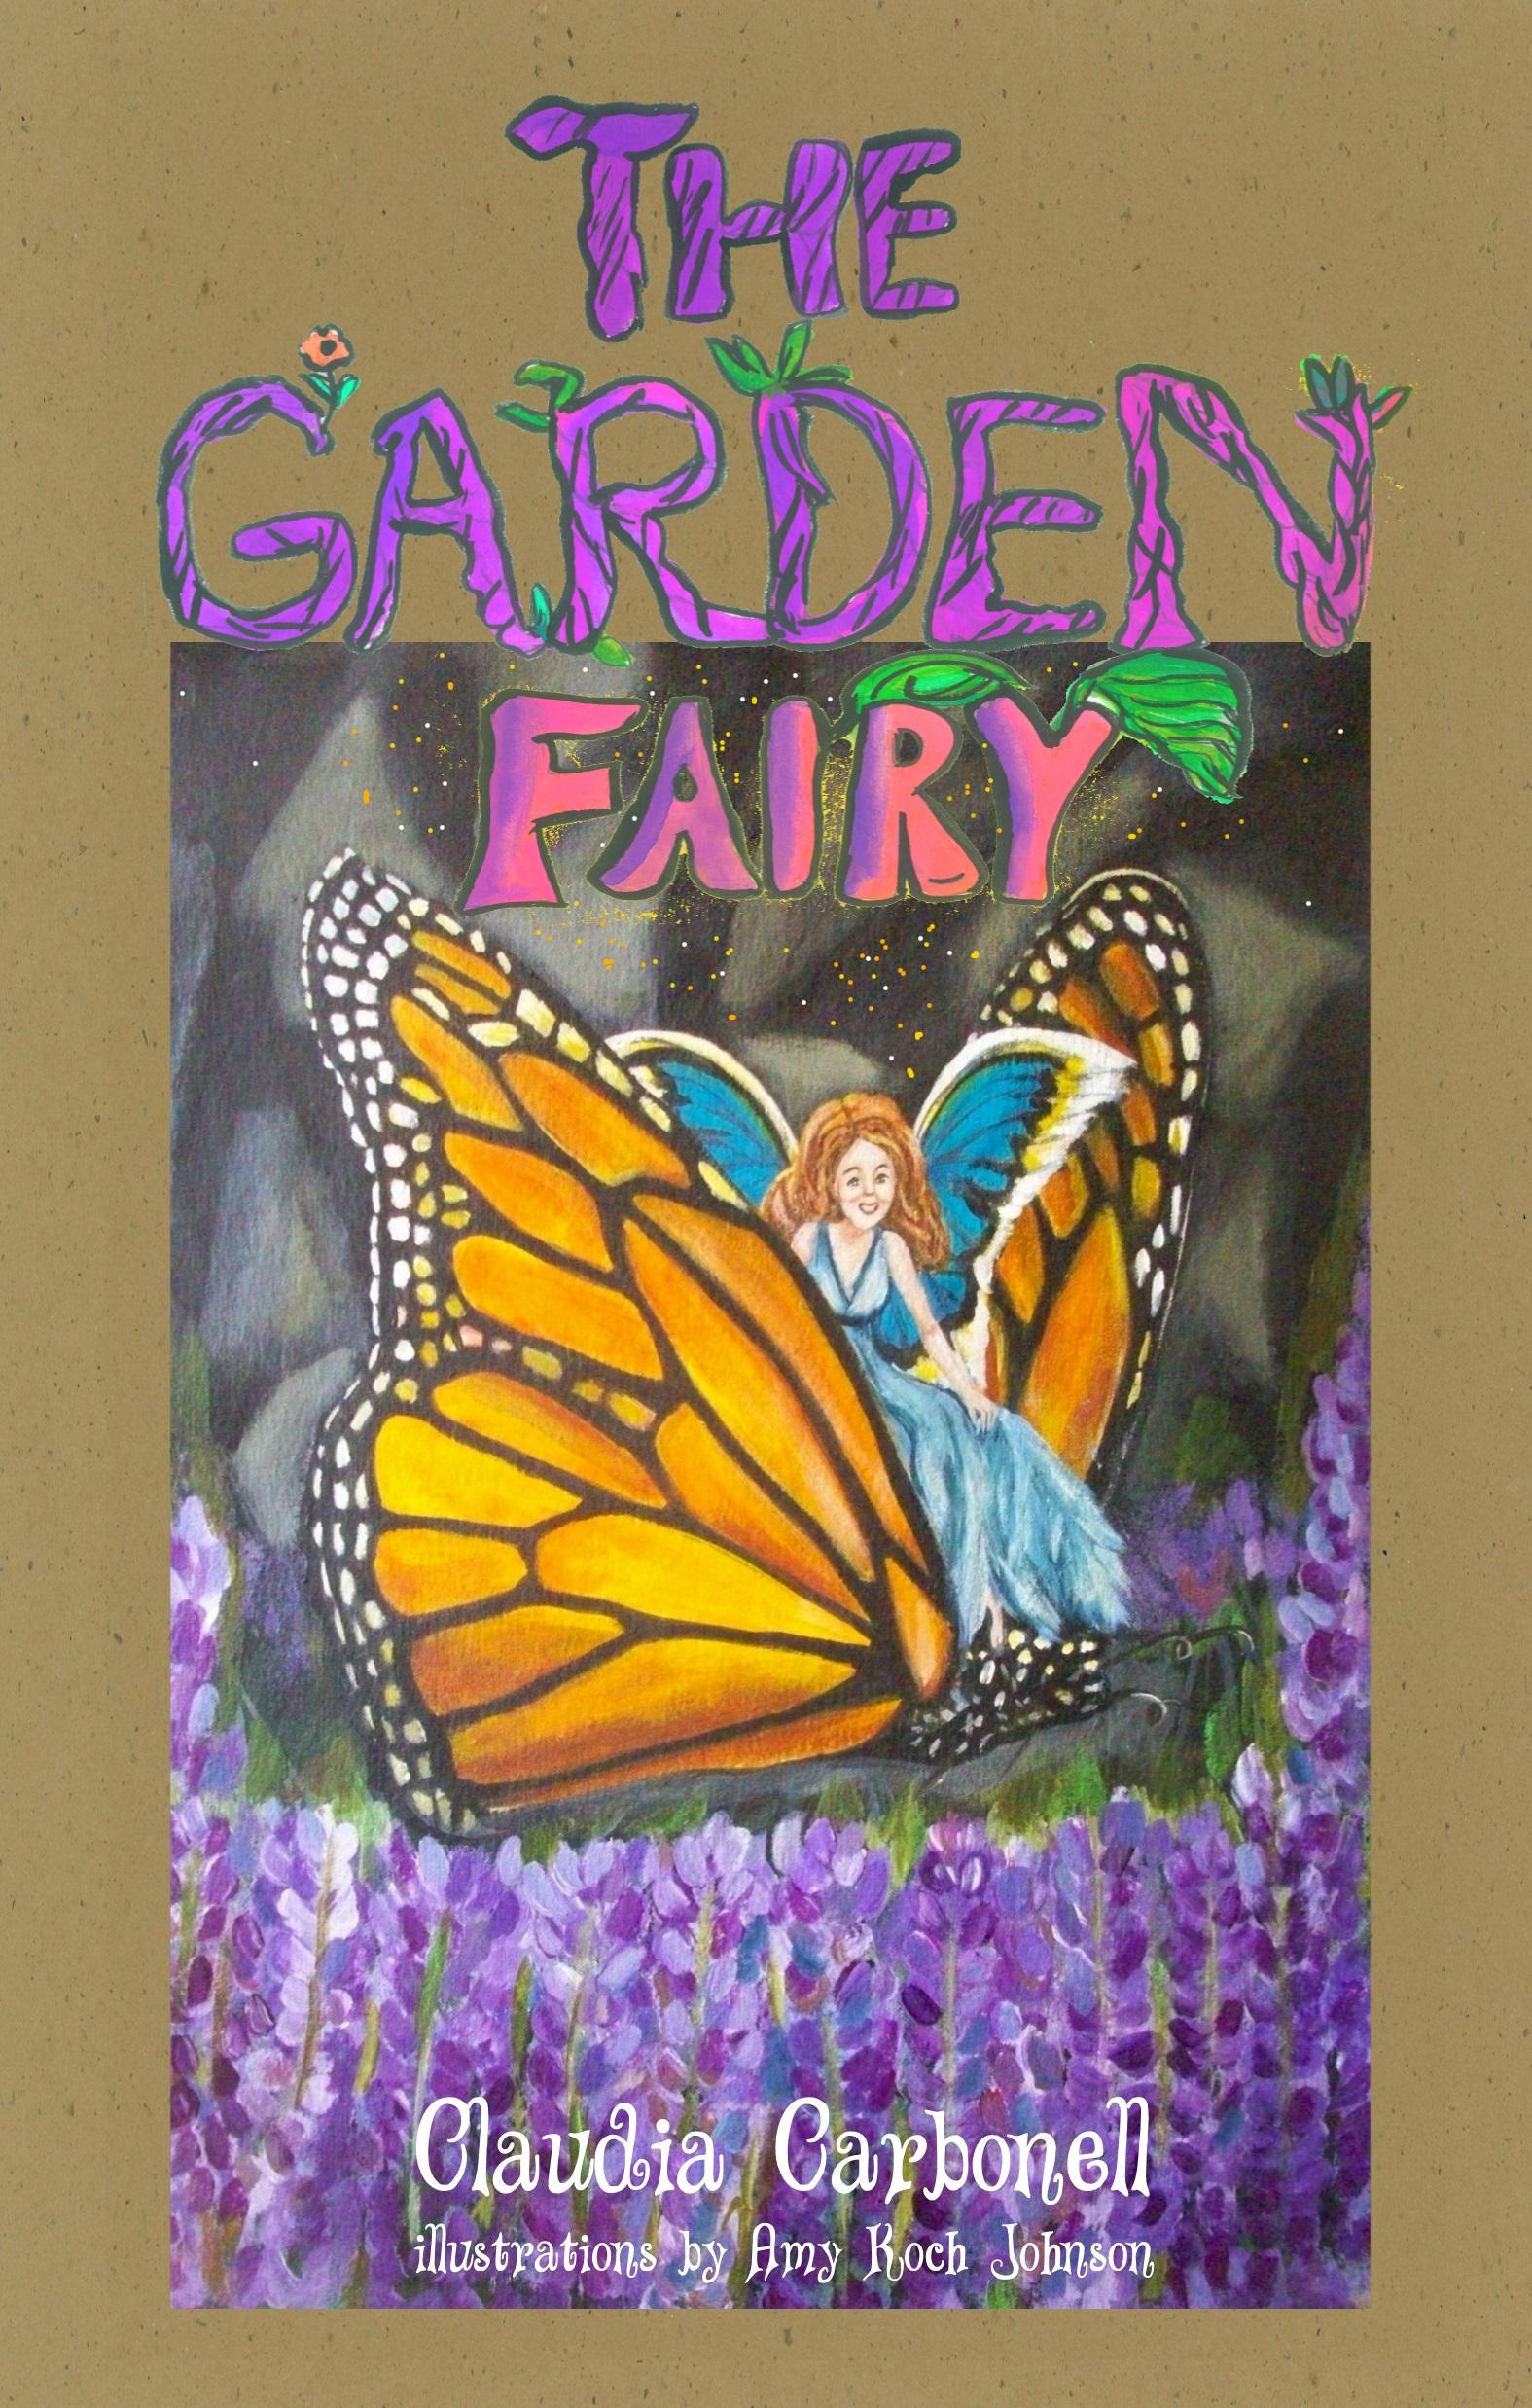 gardenfairycover3